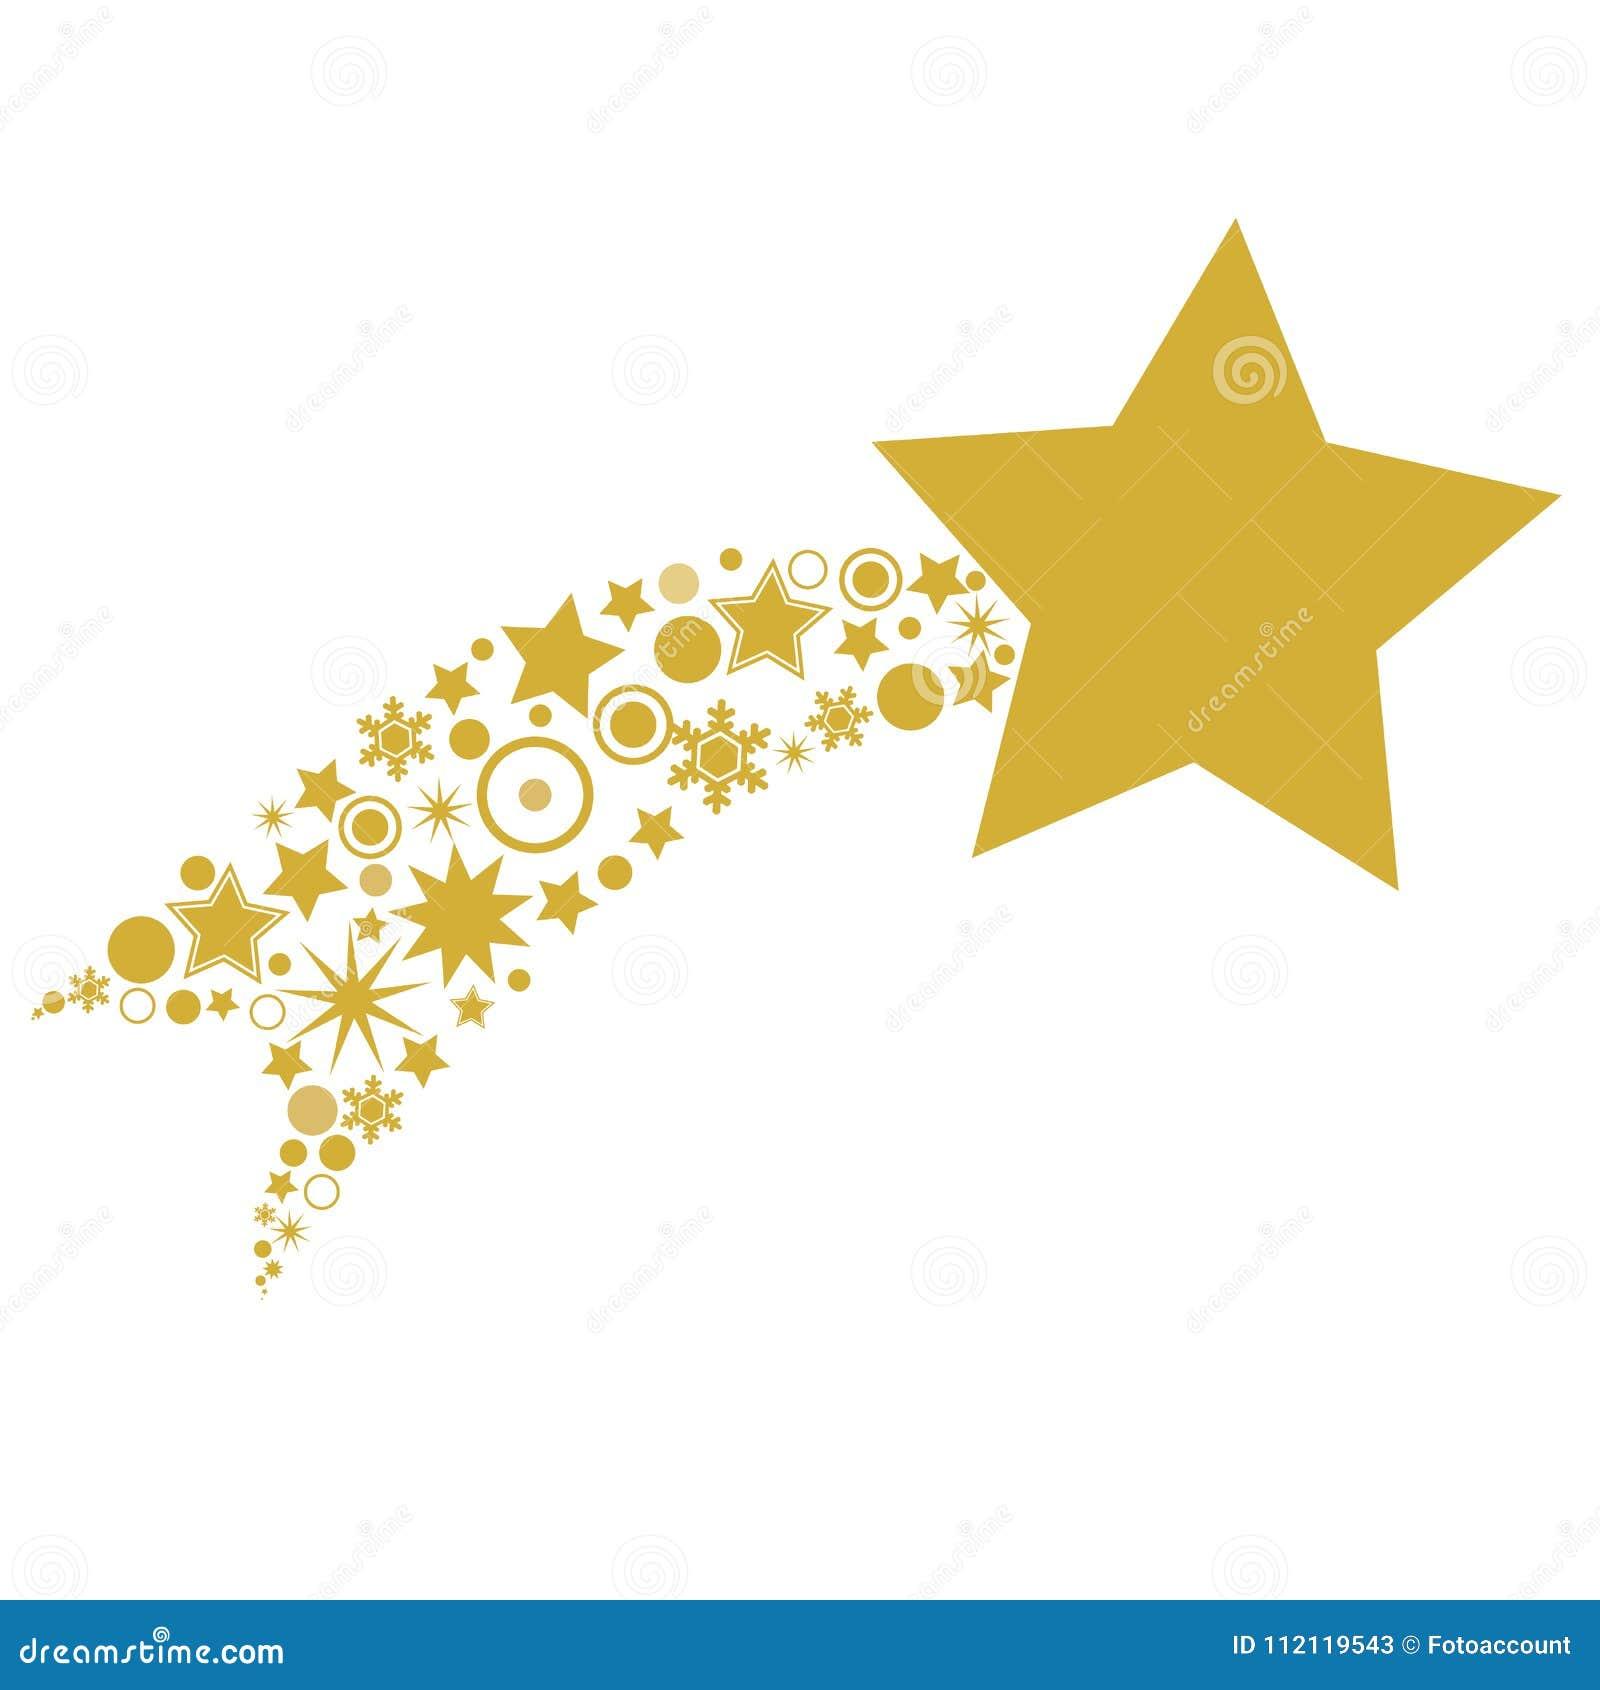 christmas-star-bethlehem-icon-vector-illustration-white-background-christmas-star-bethlehem-icon-vector-illustration-112119543.jpg